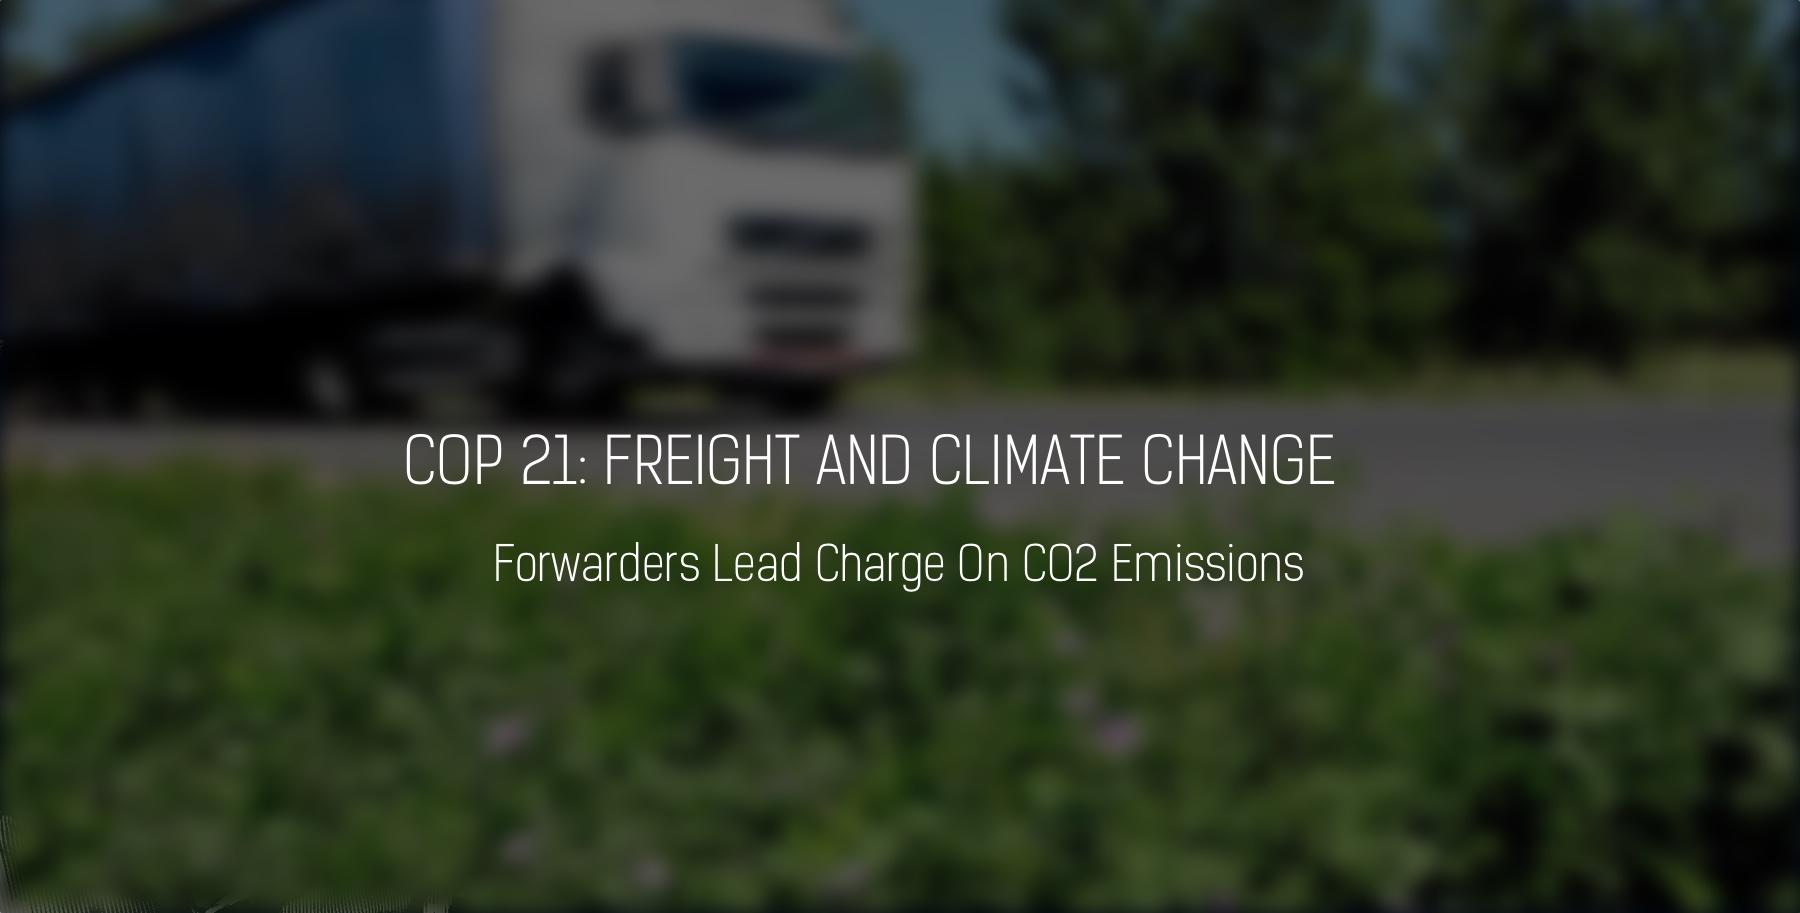 COP21 Climate Change Forwarding FINAL